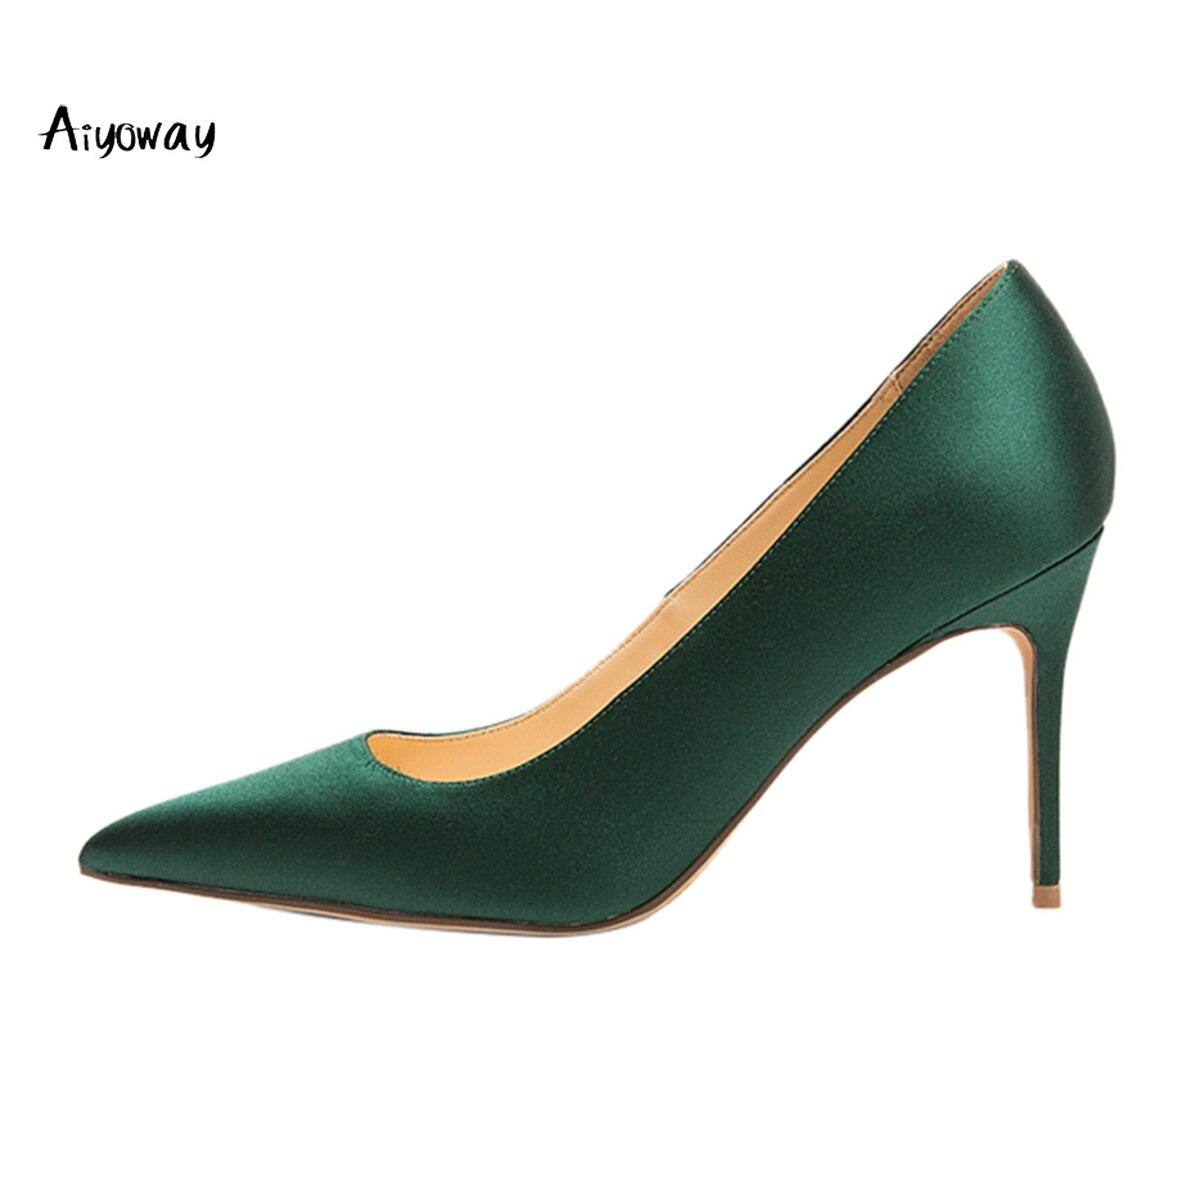 Dames Blanc Femmes Automne Pointu Bout white Satin Printemps Rouge Vert red 2019 Noce Aiyoway De Pompes on Chaussures Hauts Slip Green Talons shtrQd